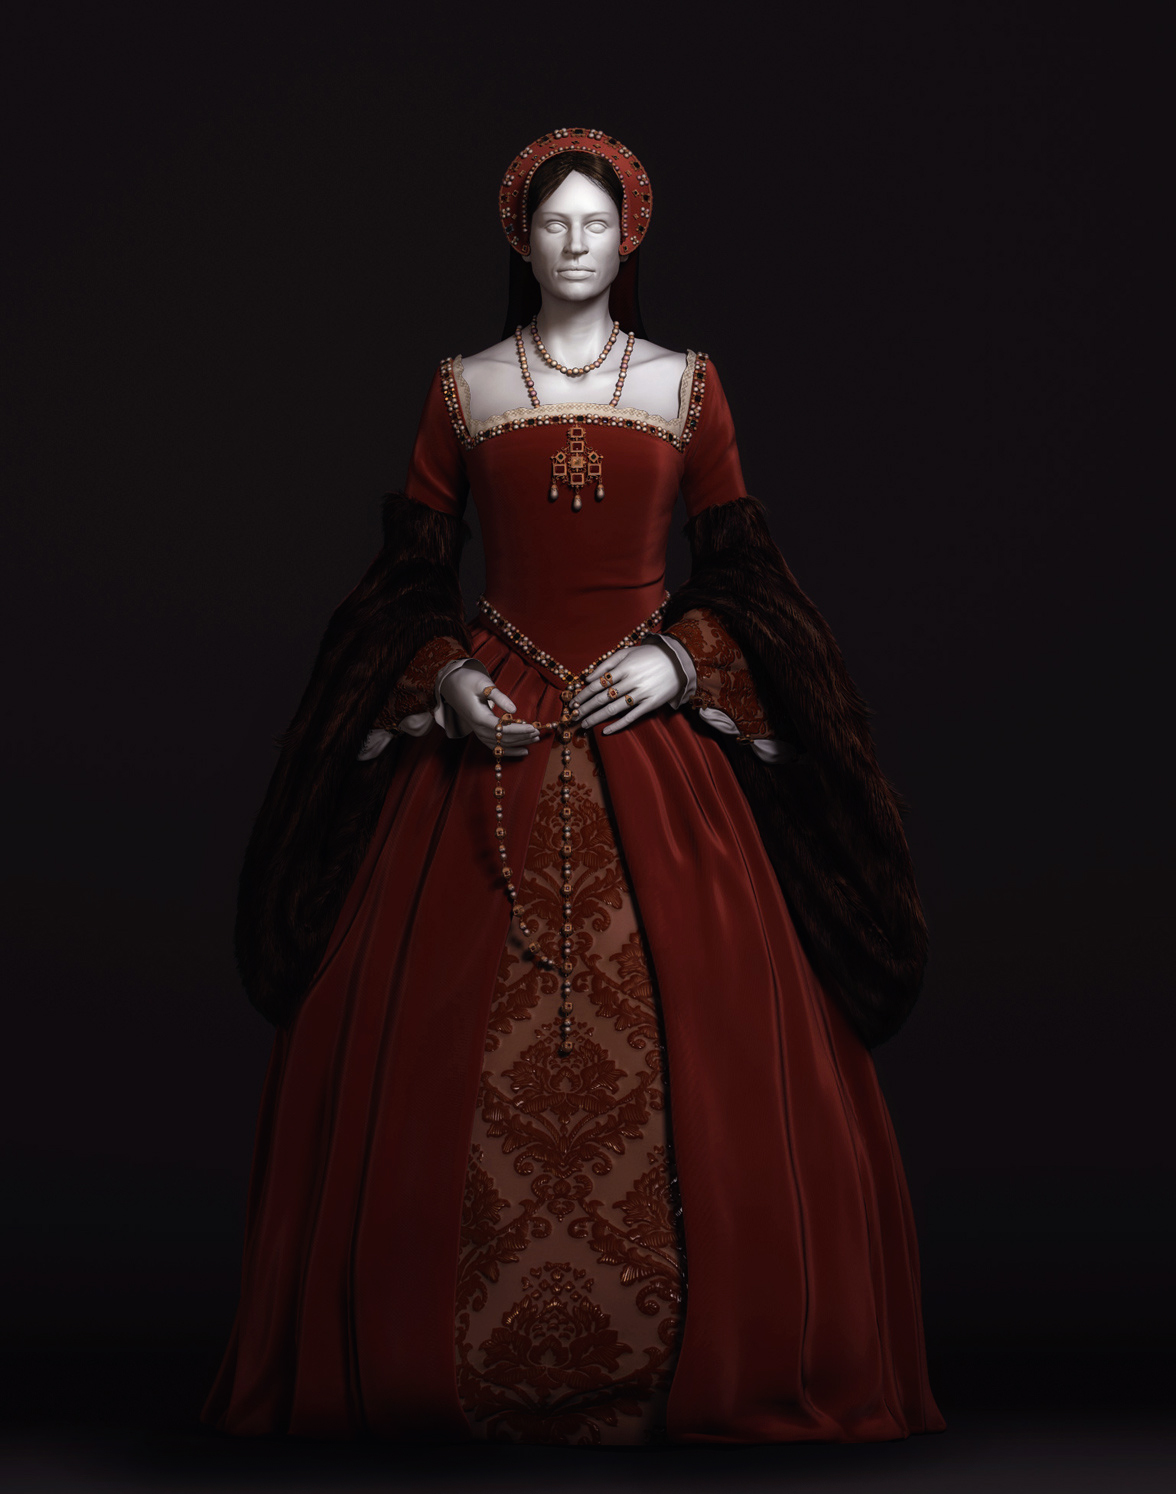 elizabethan era dresses - photo #39